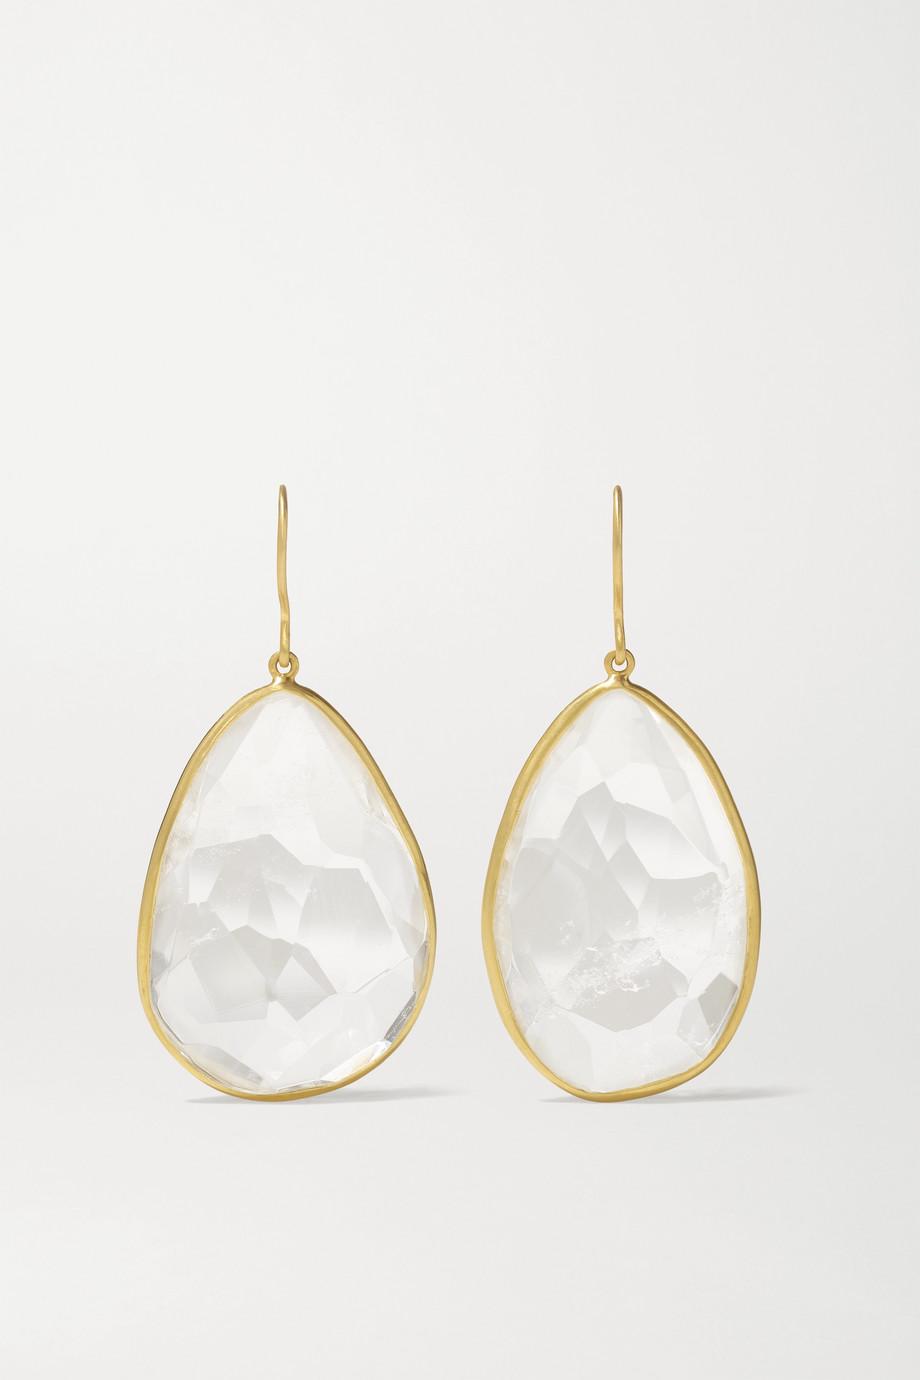 Pippa Small 18-karat gold quartz earrings